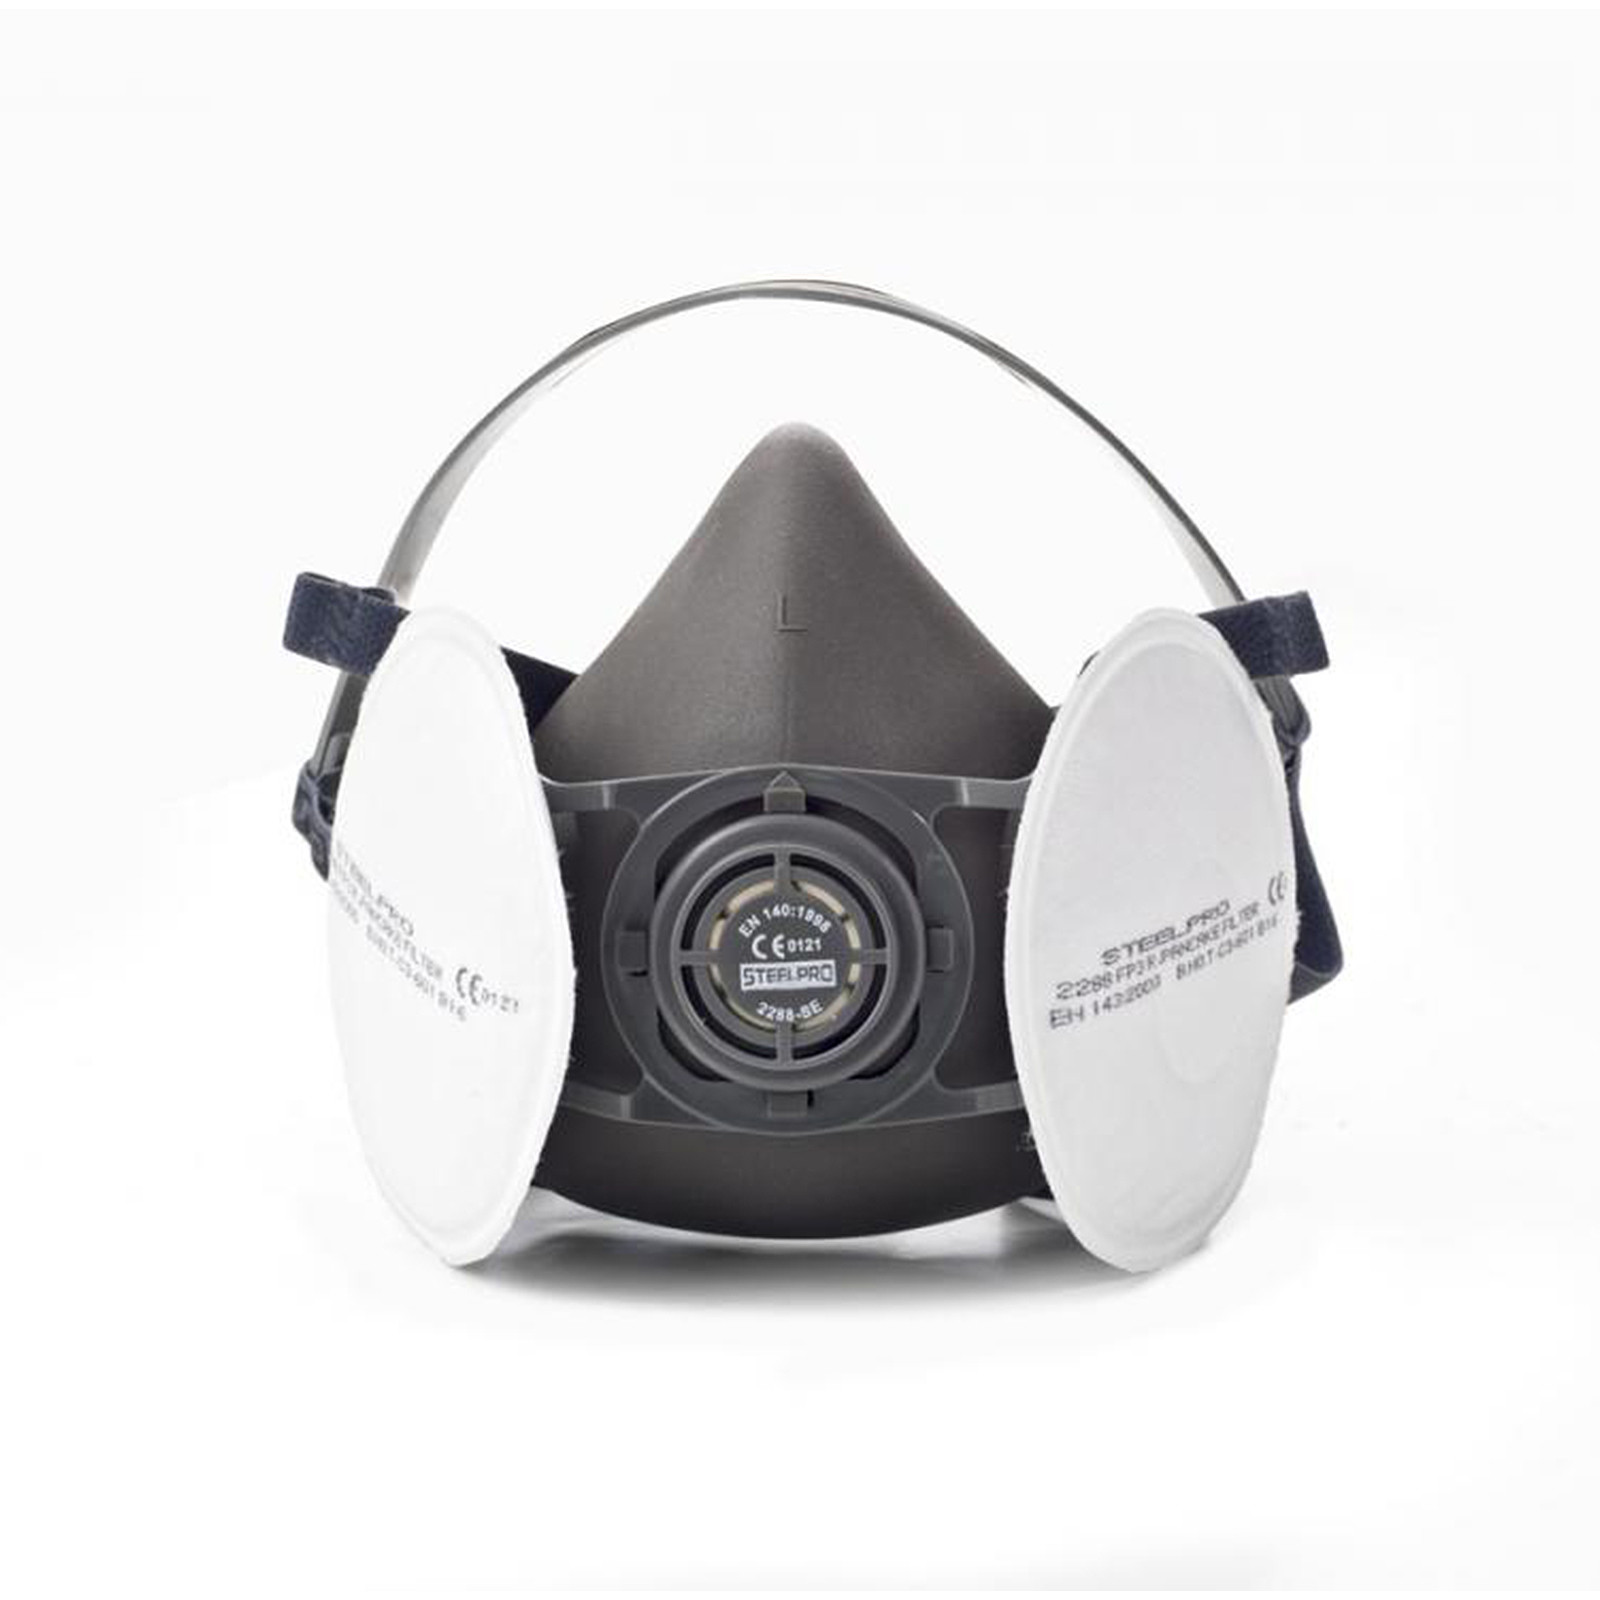 Face Mask Semi Mask Steelpro Con Filtro De Protection FP3 Reusable Size L